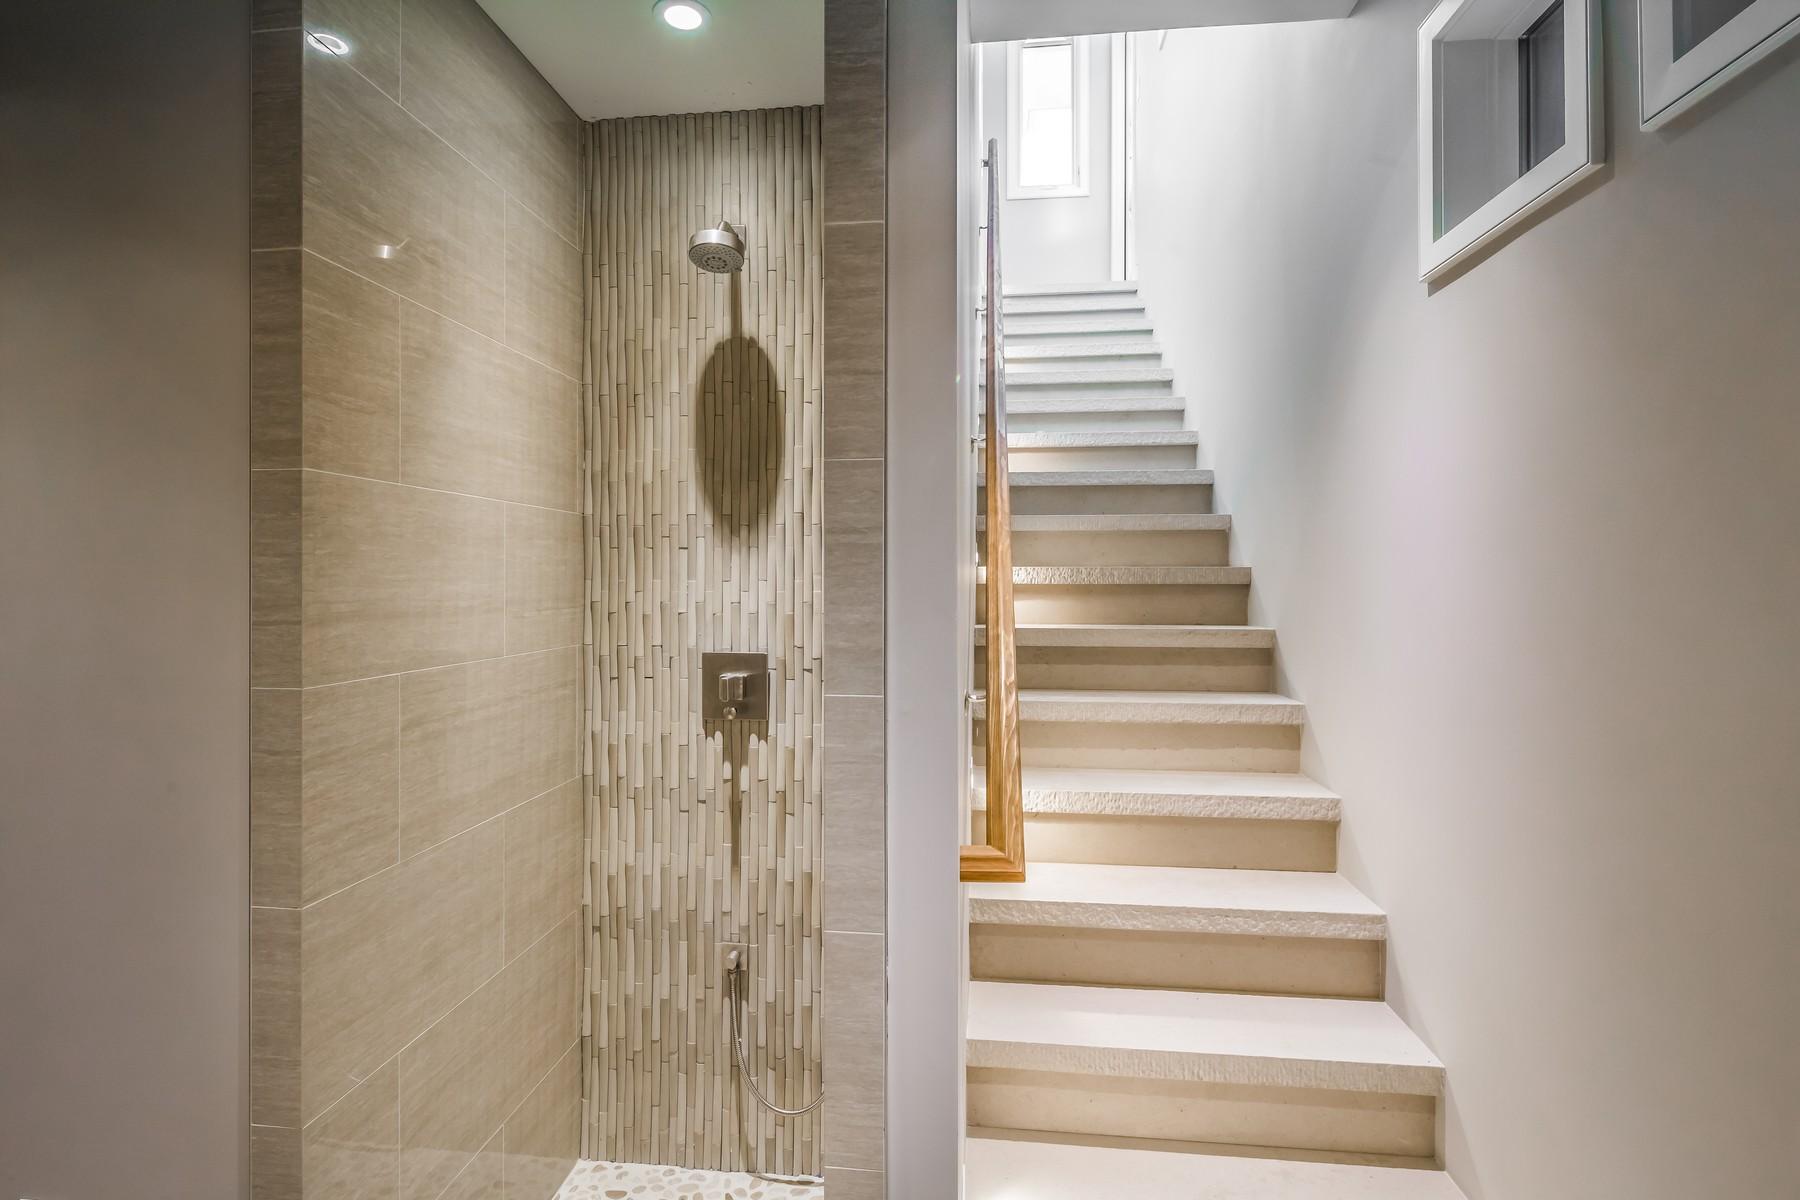 Additional photo for property listing at 824 Neptune Avenue  恩悉尼塔斯, 加利福尼亚州 92024 美国